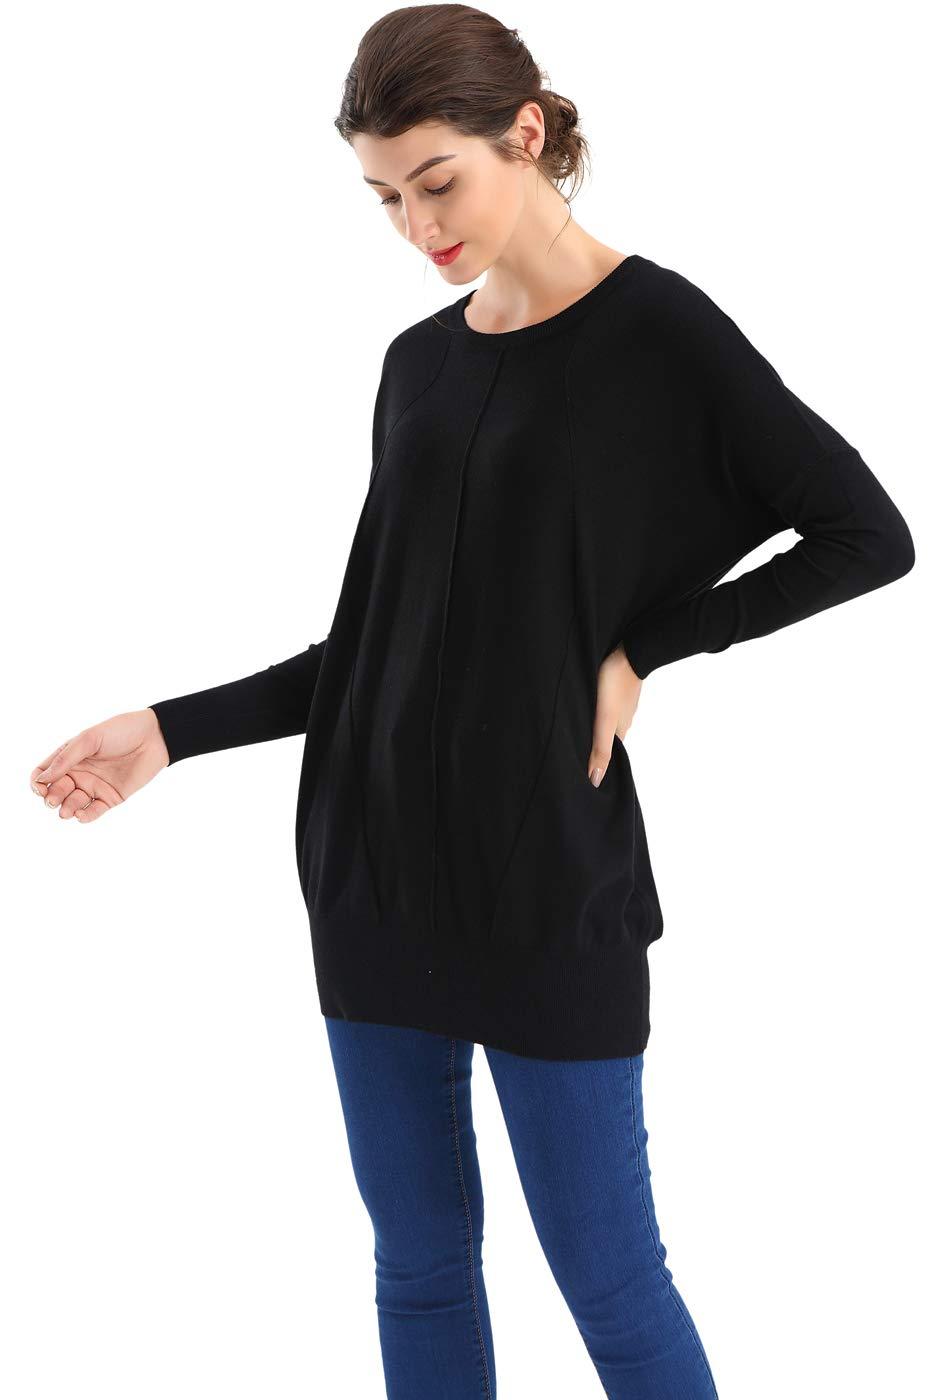 BodiLove Women's Dolman Sleeve Boat Neck Oversized Sweater Top Black XL